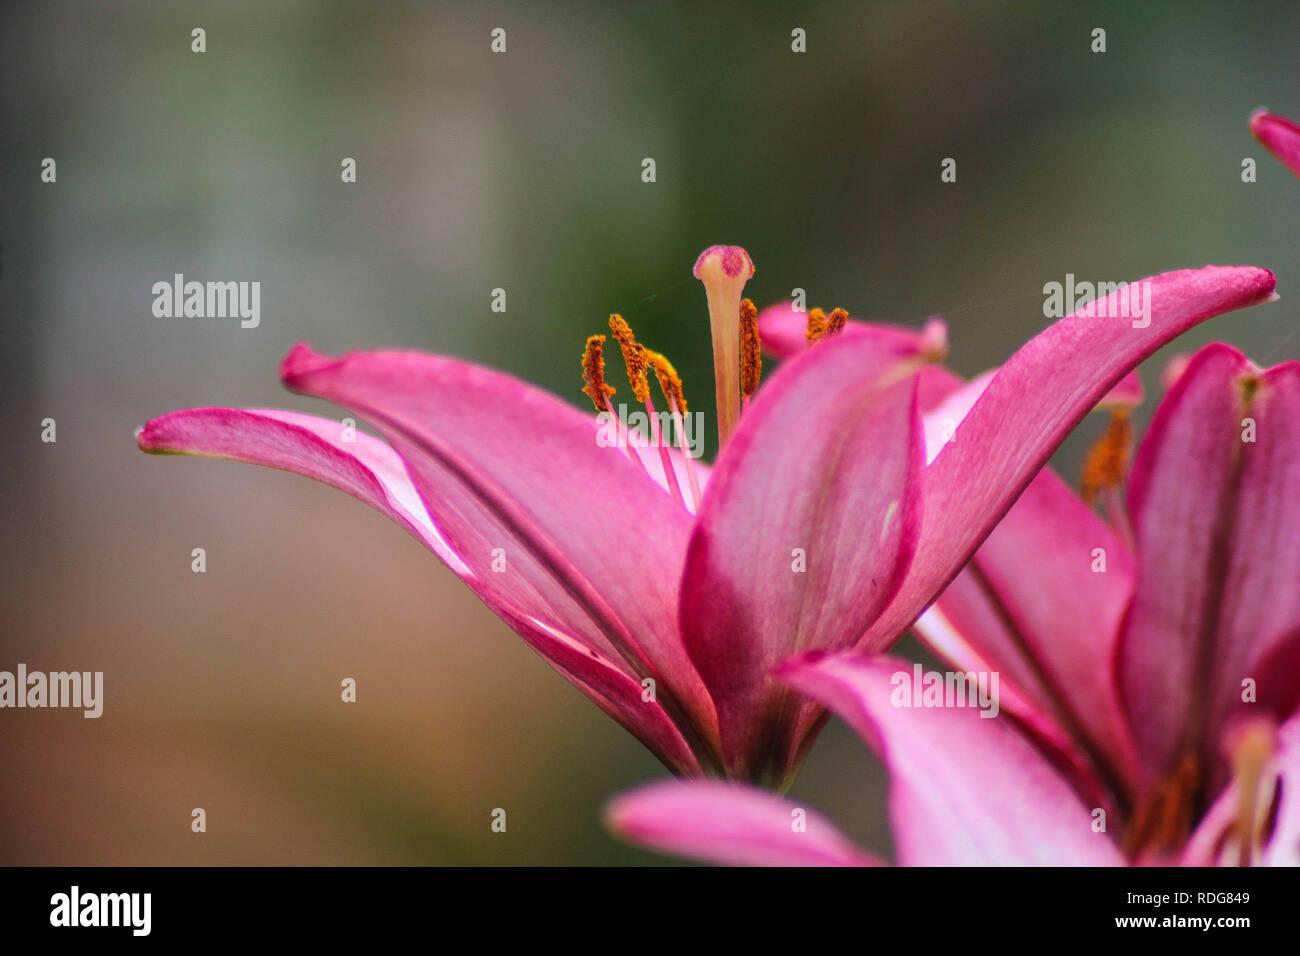 Blooming Lily Beautiful Blooming Summer Flower Flower Petals